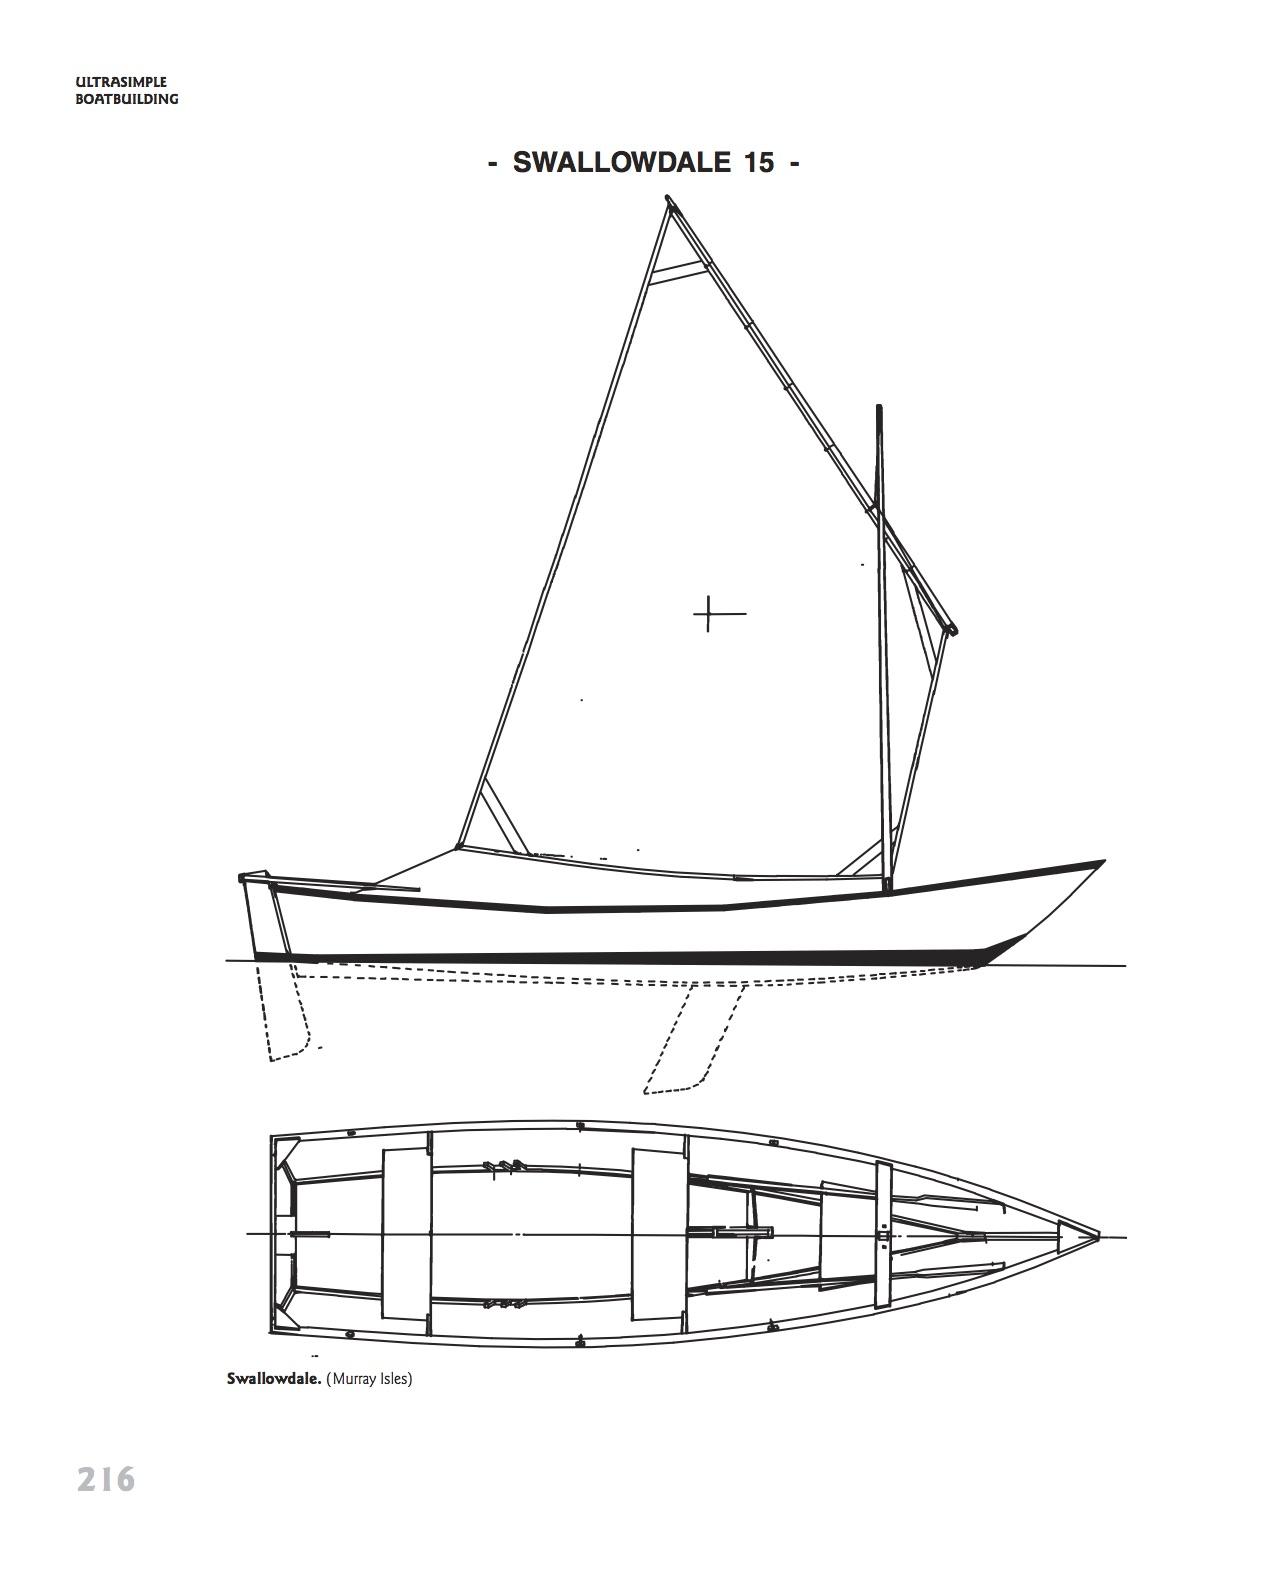 Ultrasimple,dinghy,Building,Can,Boats Ultrasimple Boat Building 17 Plywood Boats Anyone Can Build  115000u00842v926j69zff